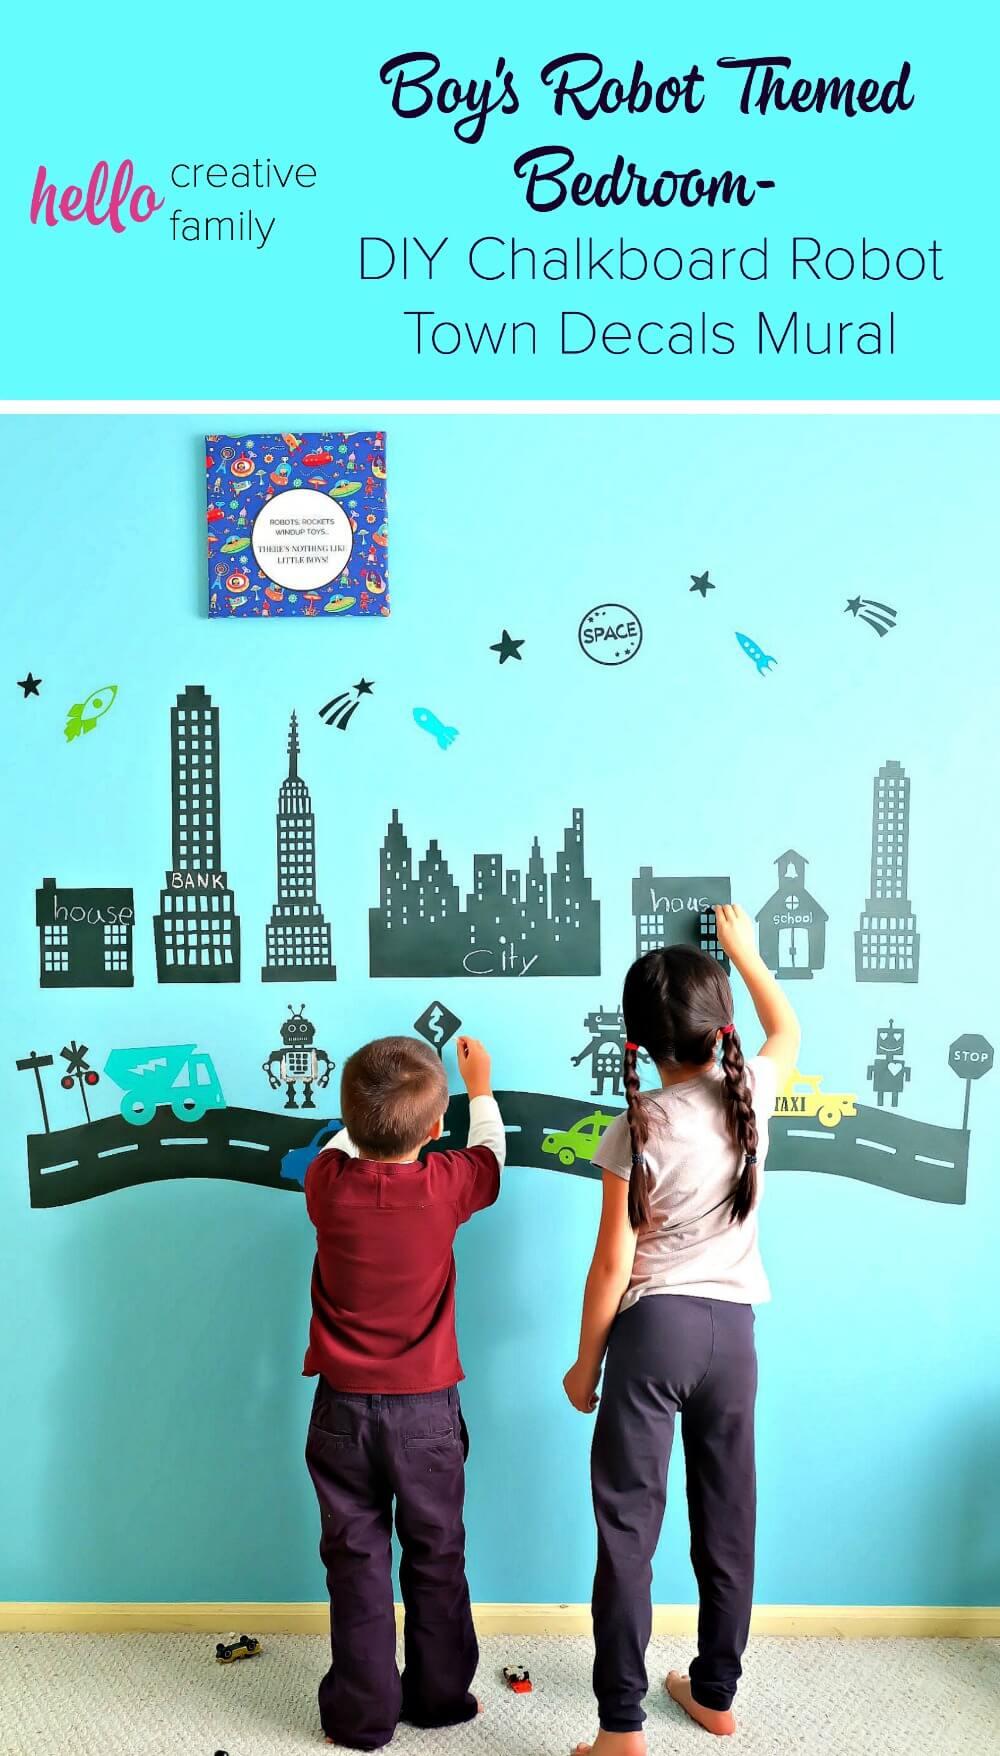 Chalkboard Robot Town Wall Decals Mural